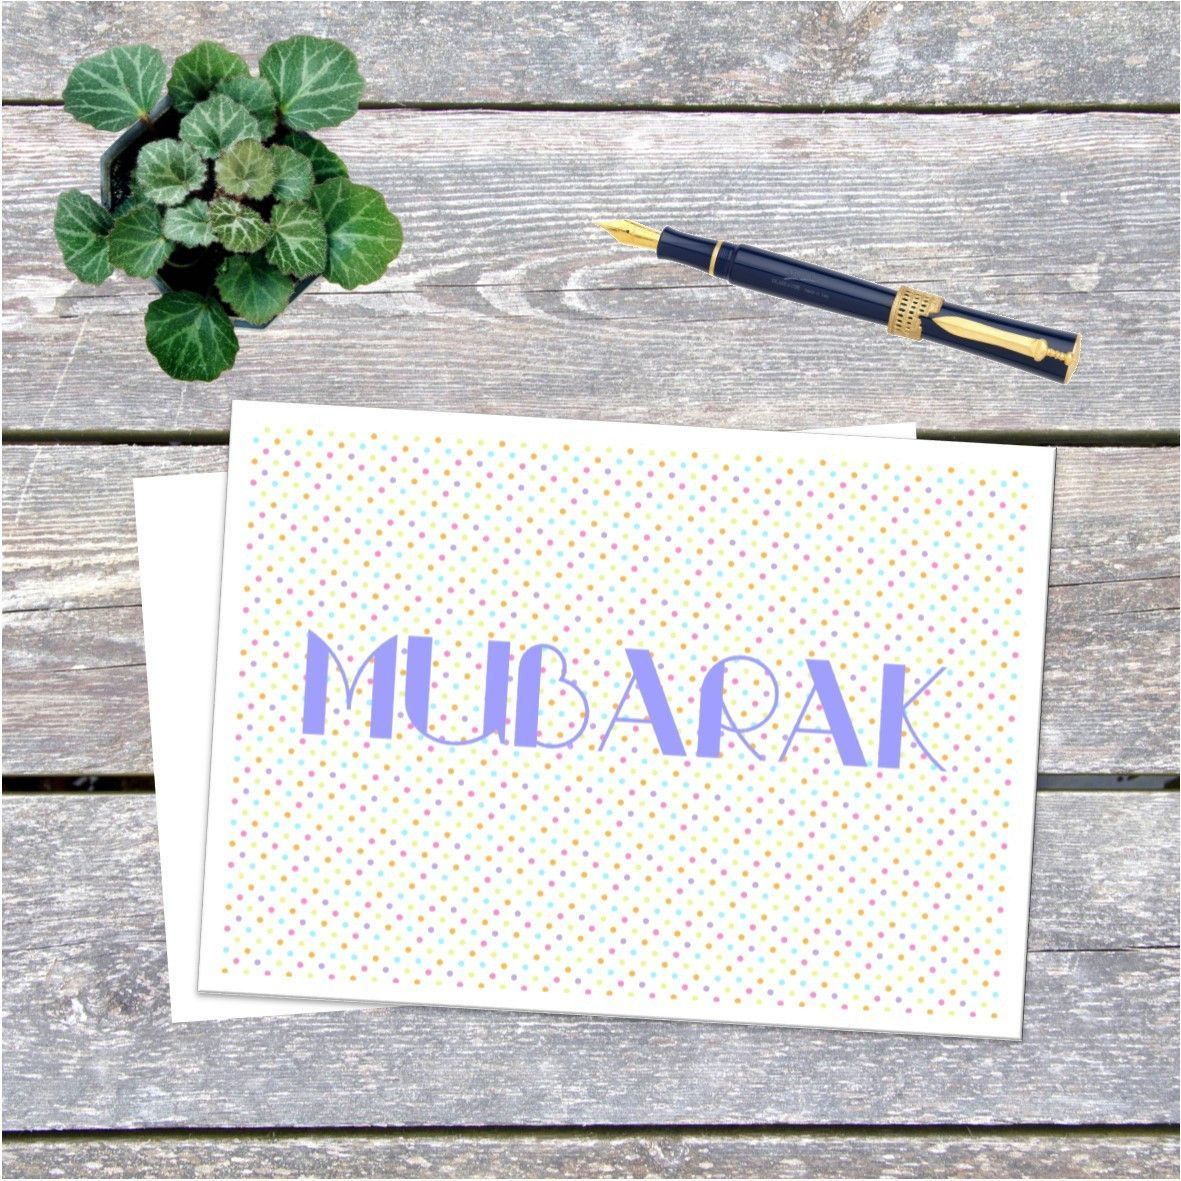 Mubarak congrats islamic greeting card products pinterest mubarak congrats islamic greeting card from kaamilah online kristyandbryce Image collections